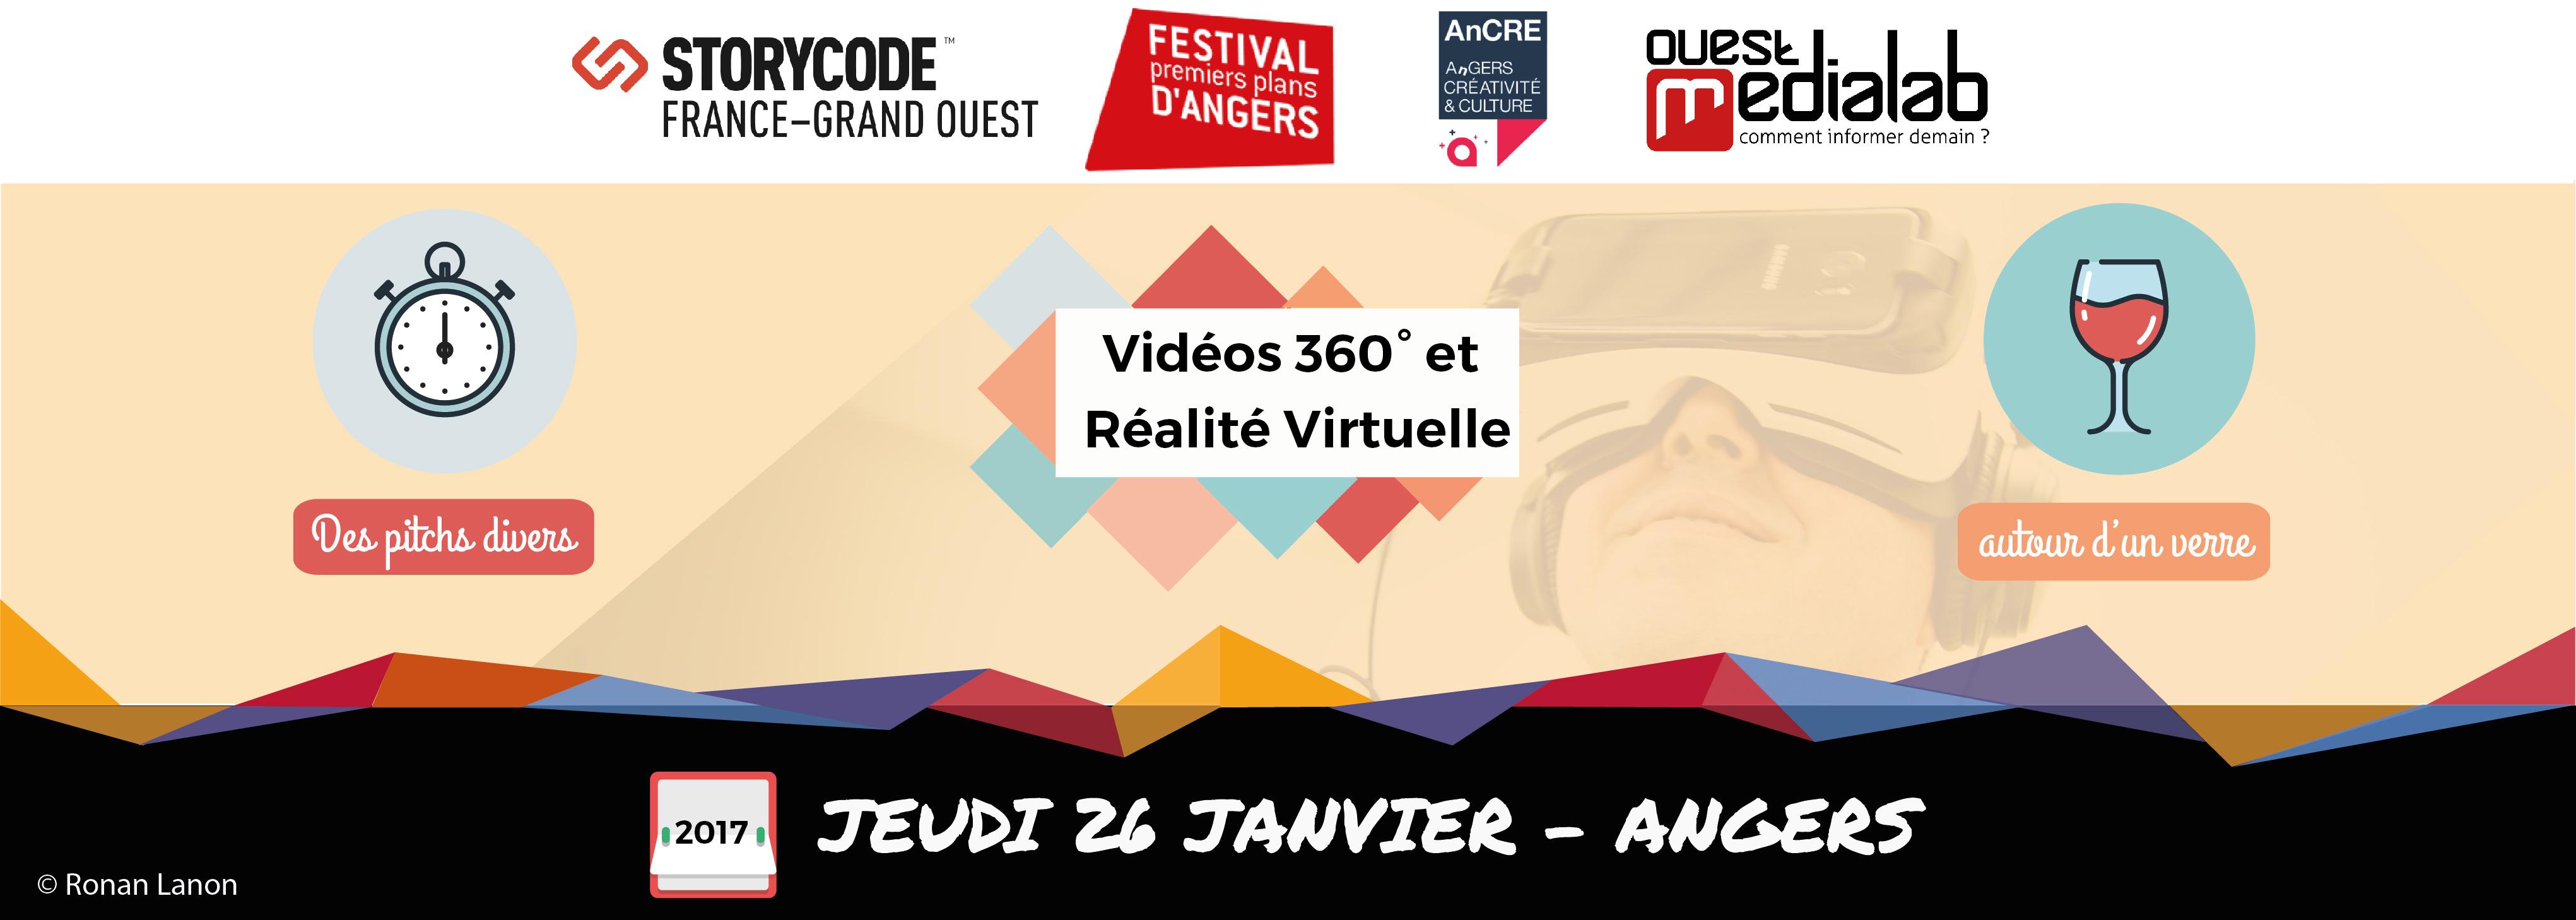 slider-StoryCode-VR-Premiers-Plans2-01